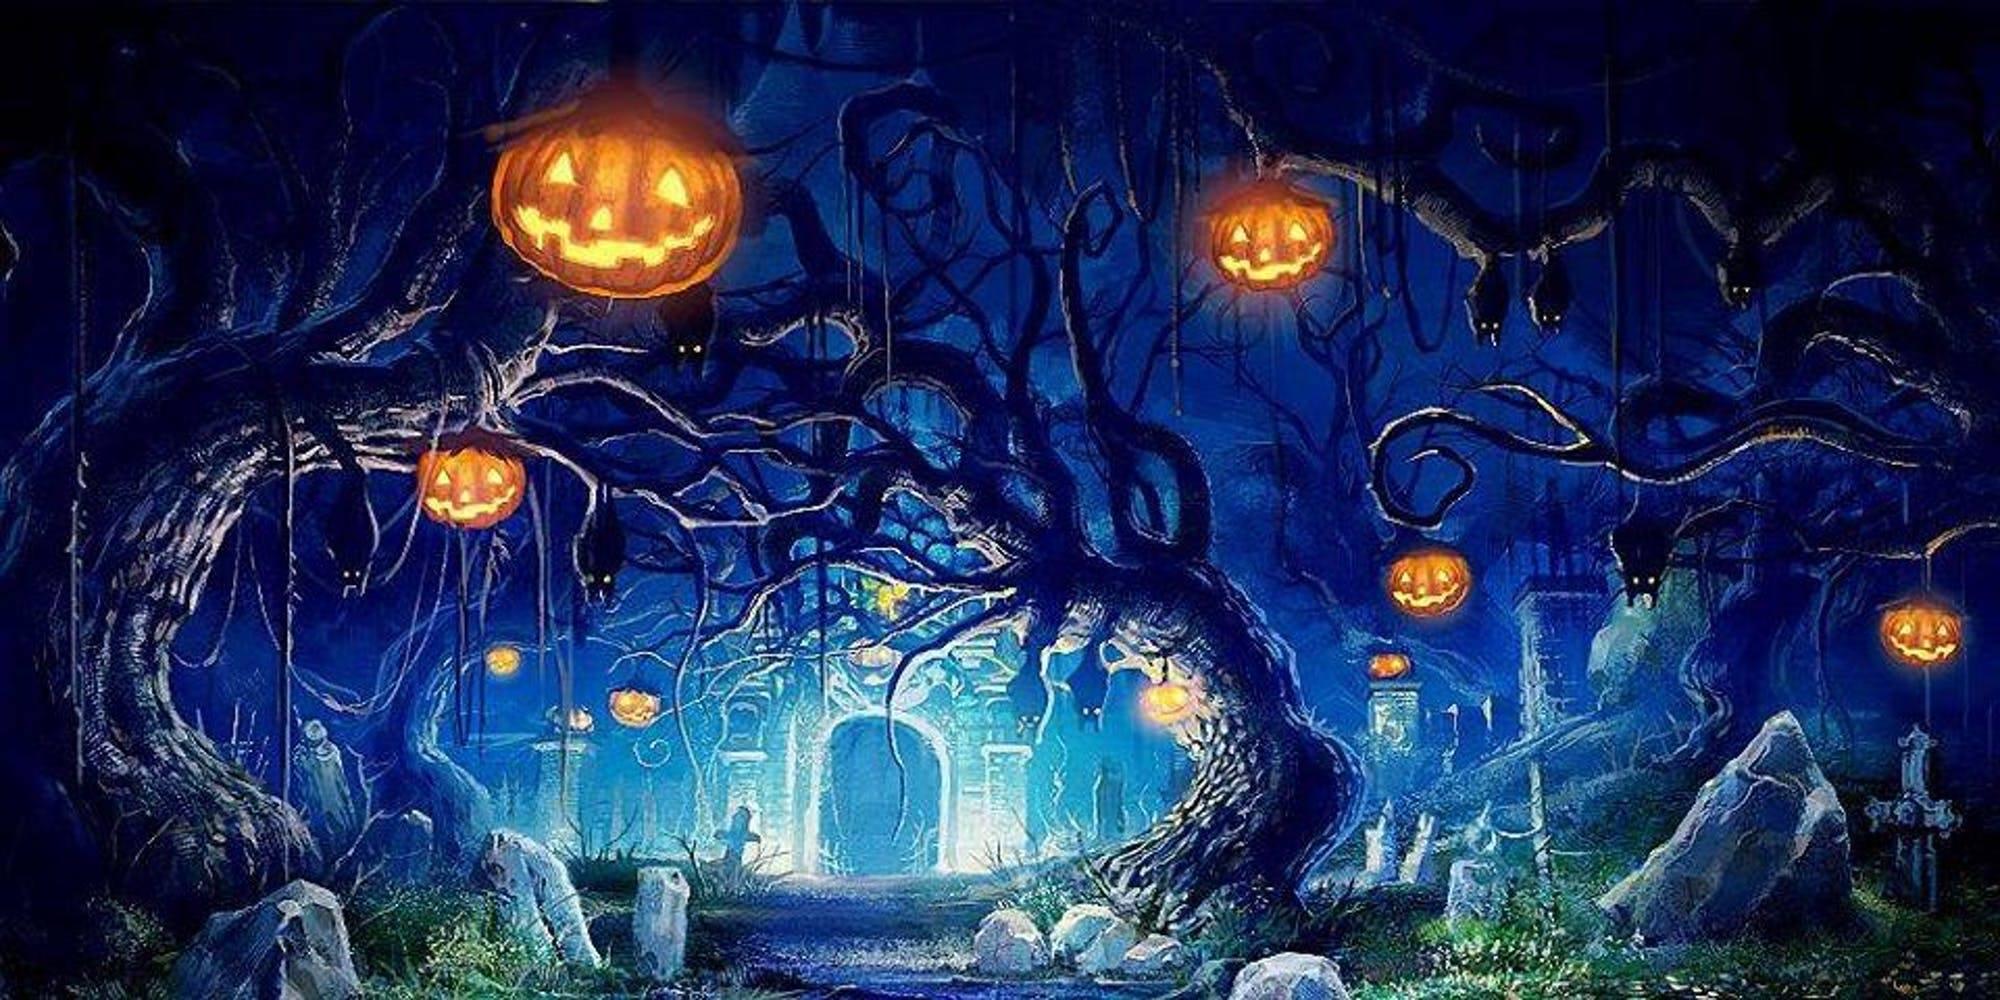 Halloween 55 Fifty Five Milano sabato 31 Ottobre 2018